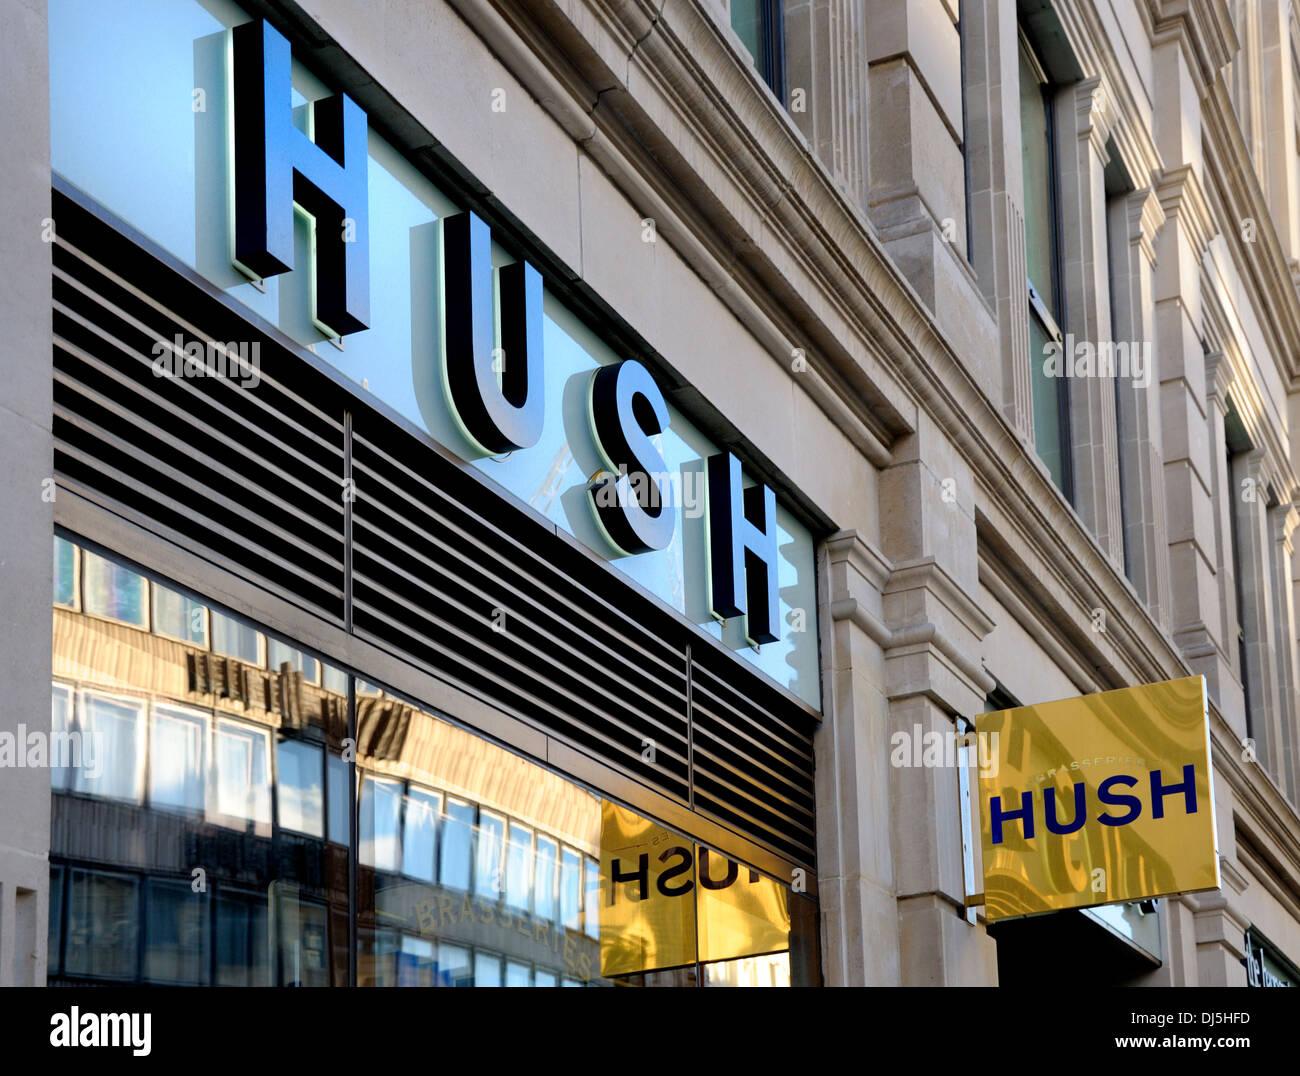 London, England, UK. Hush brasserie facade - Stock Image